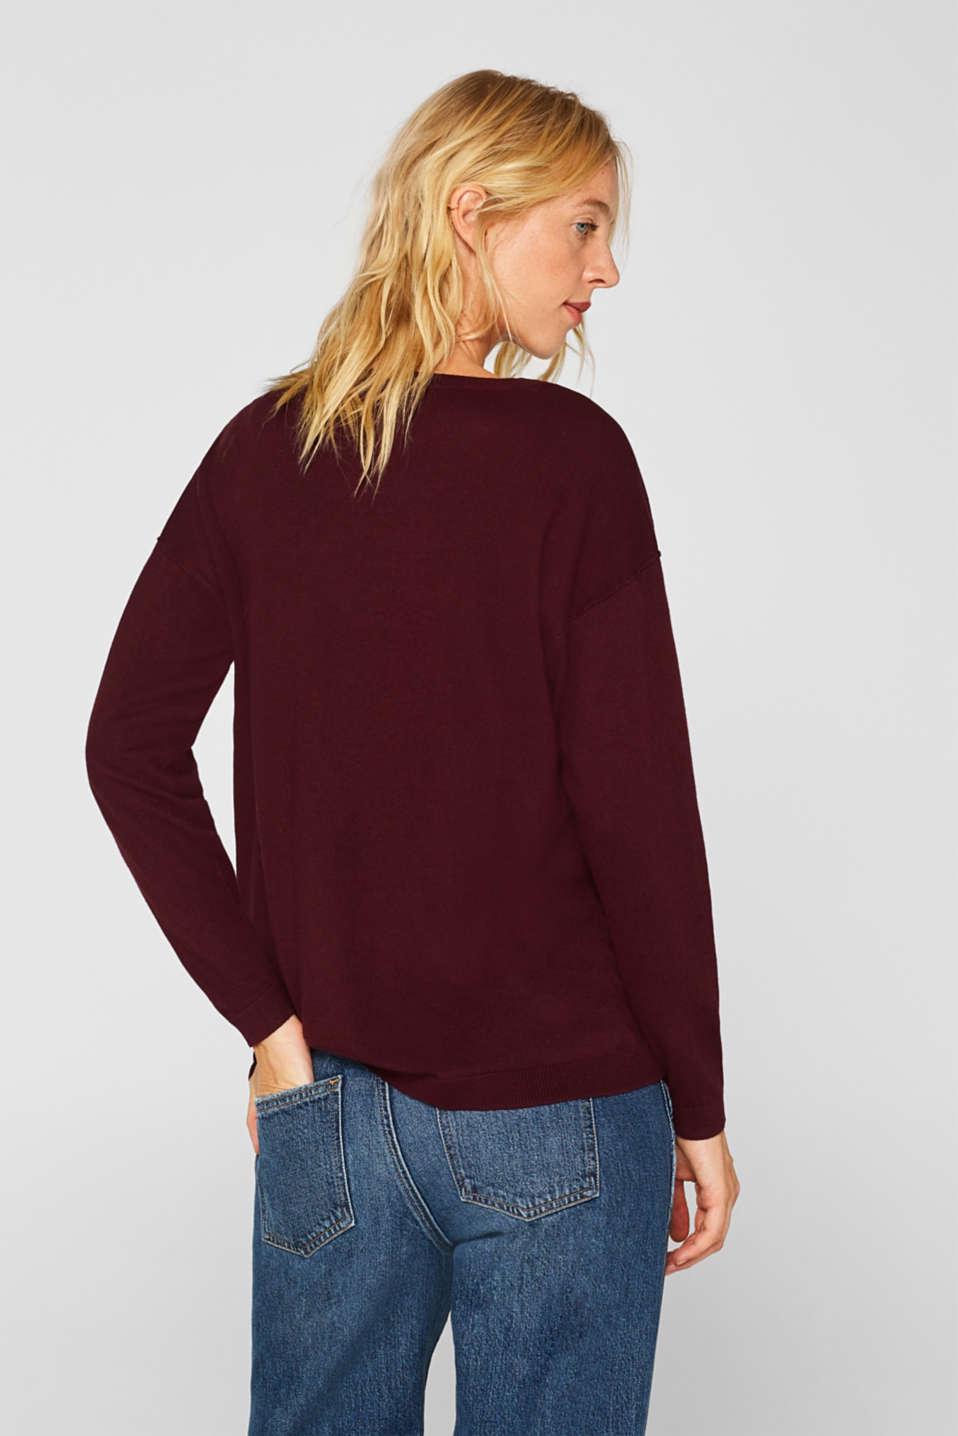 Fine knit jumper with on-trend details, BORDEAUX RED, detail image number 3